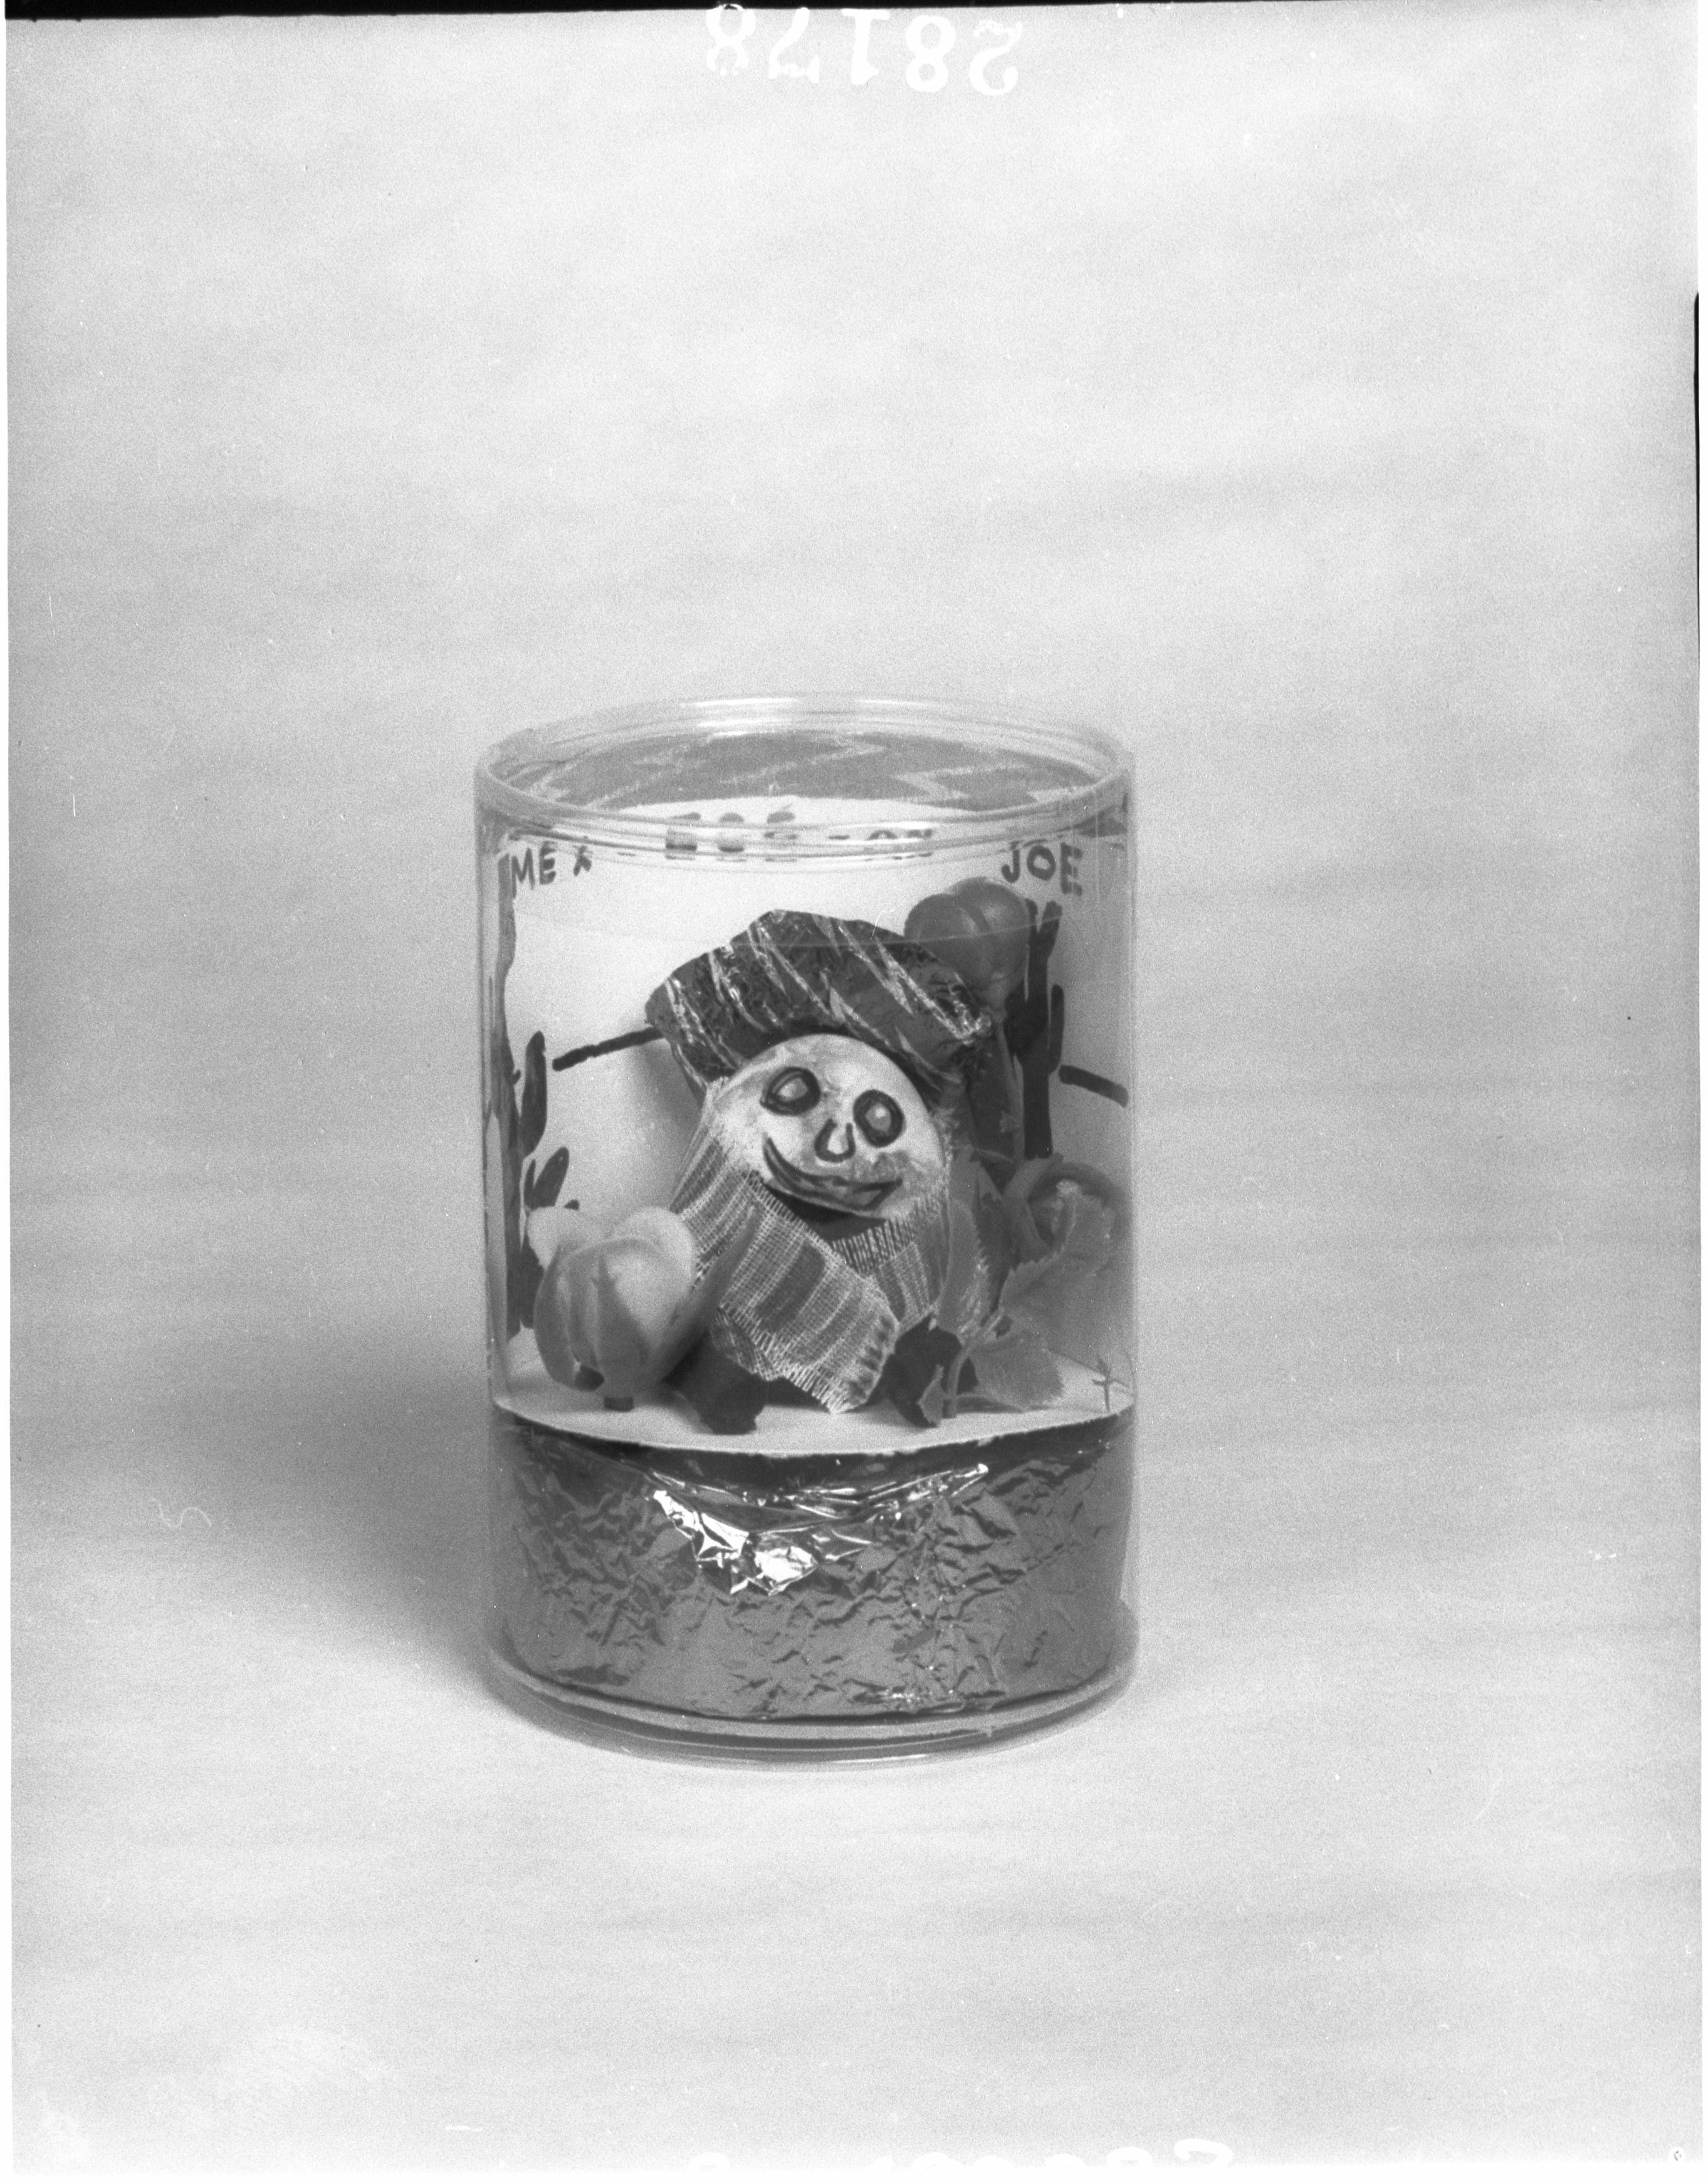 APA studio photographs of hens' eggs painted to make figurine ornaments,  Tony Middleton, APA